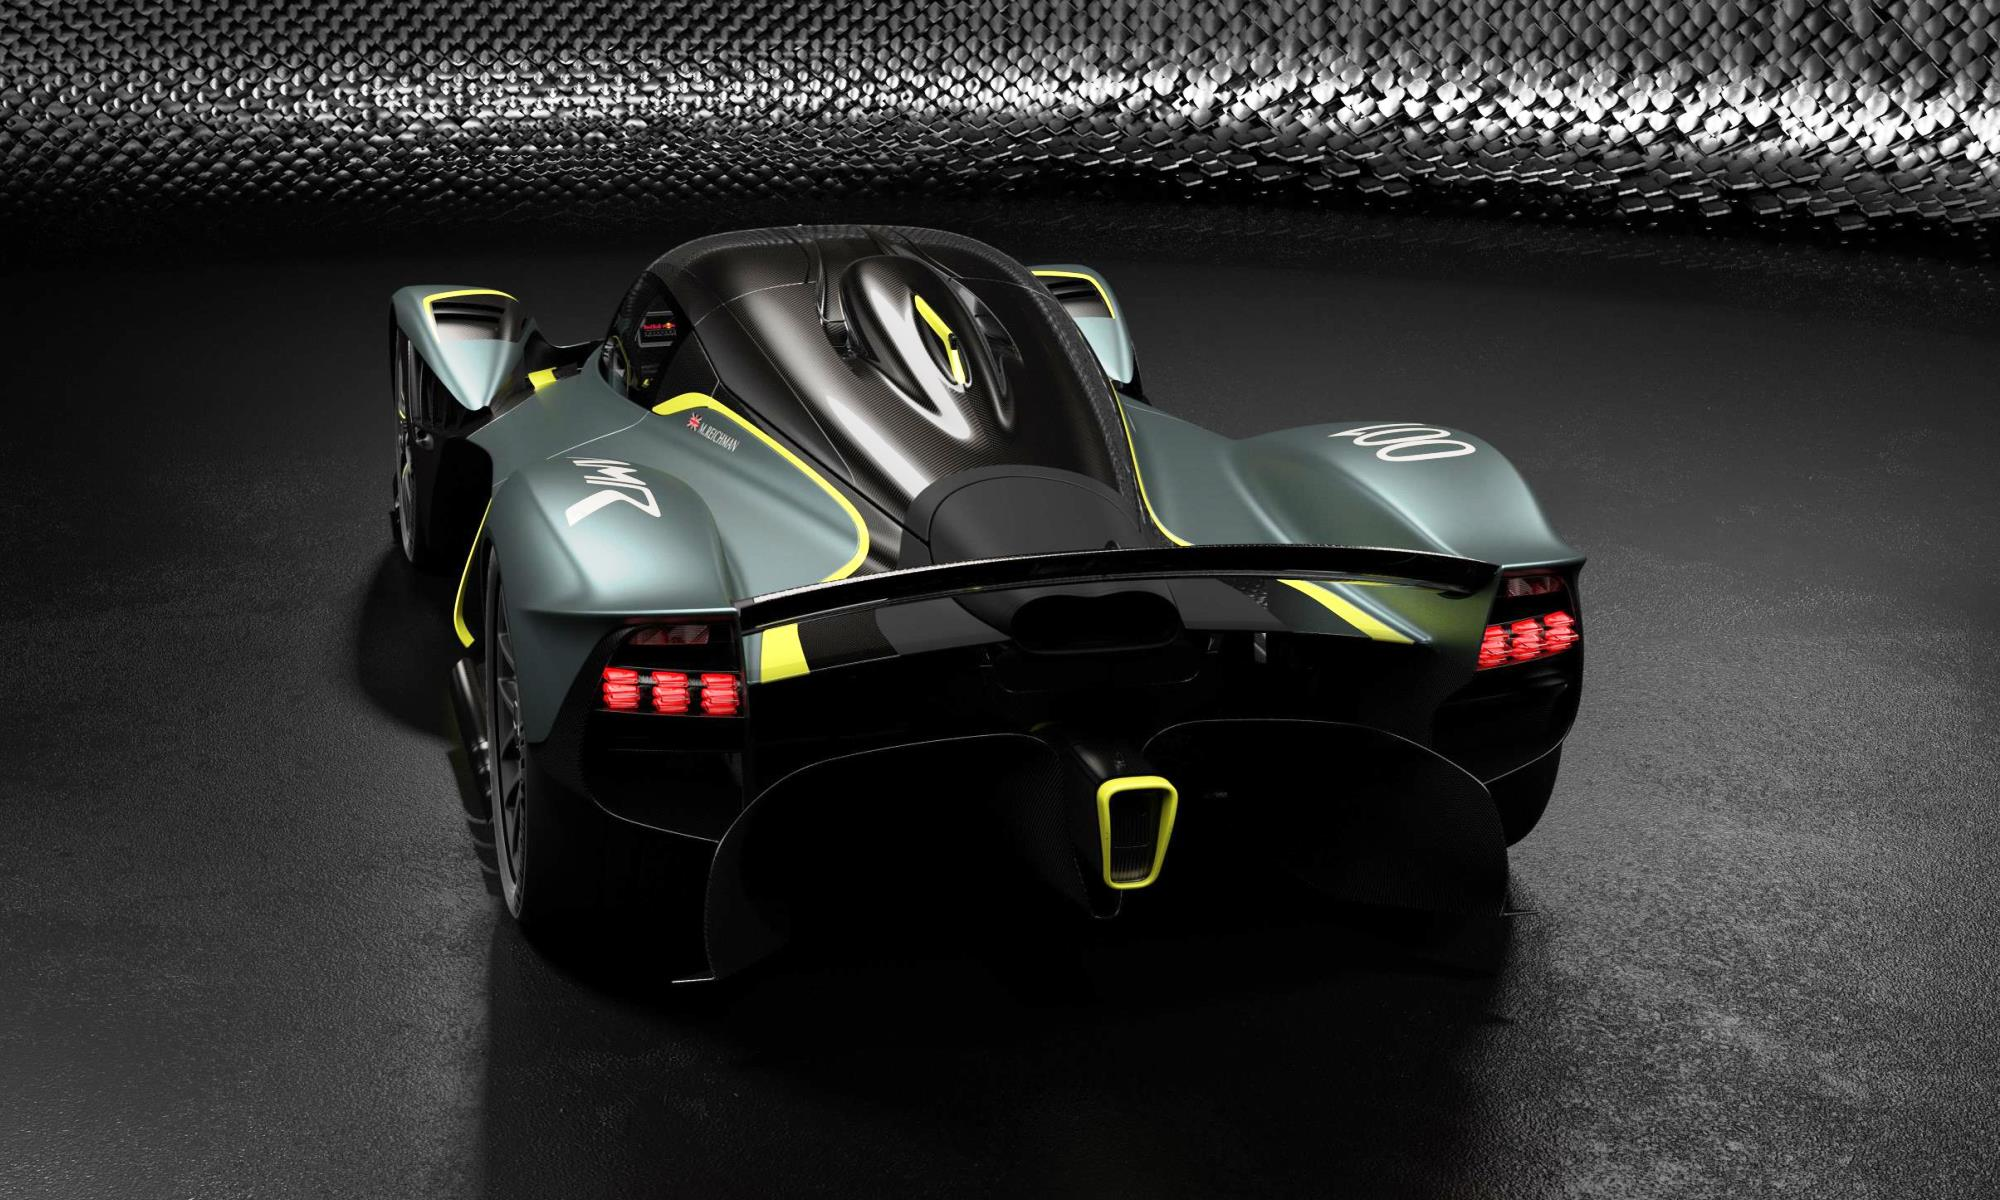 Aston-Martin-Valkyrie-rear